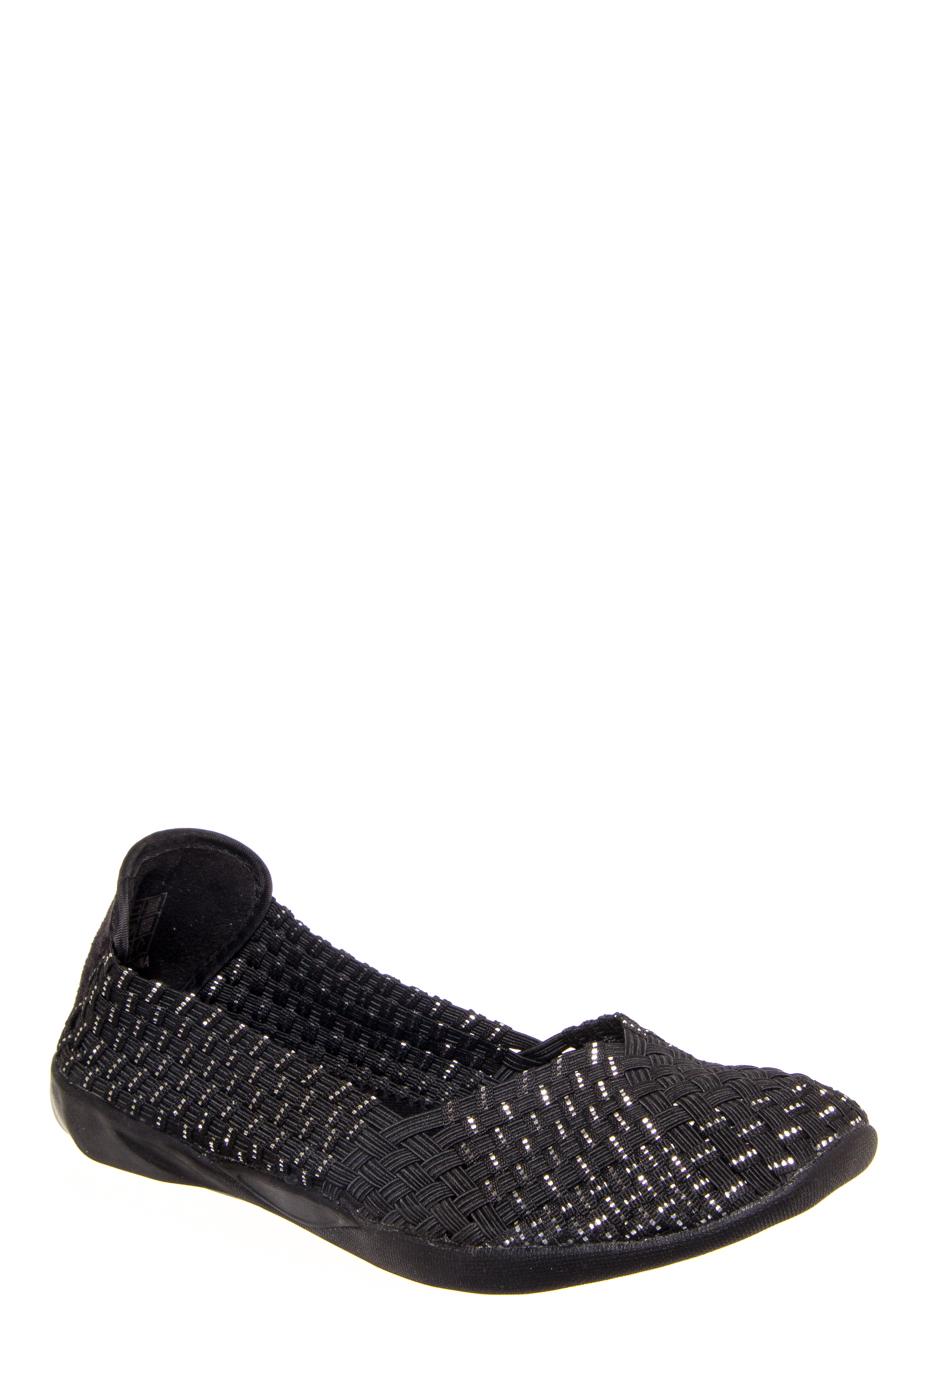 Bernie Mev Catwalk Comfort Flats - Black / Silver